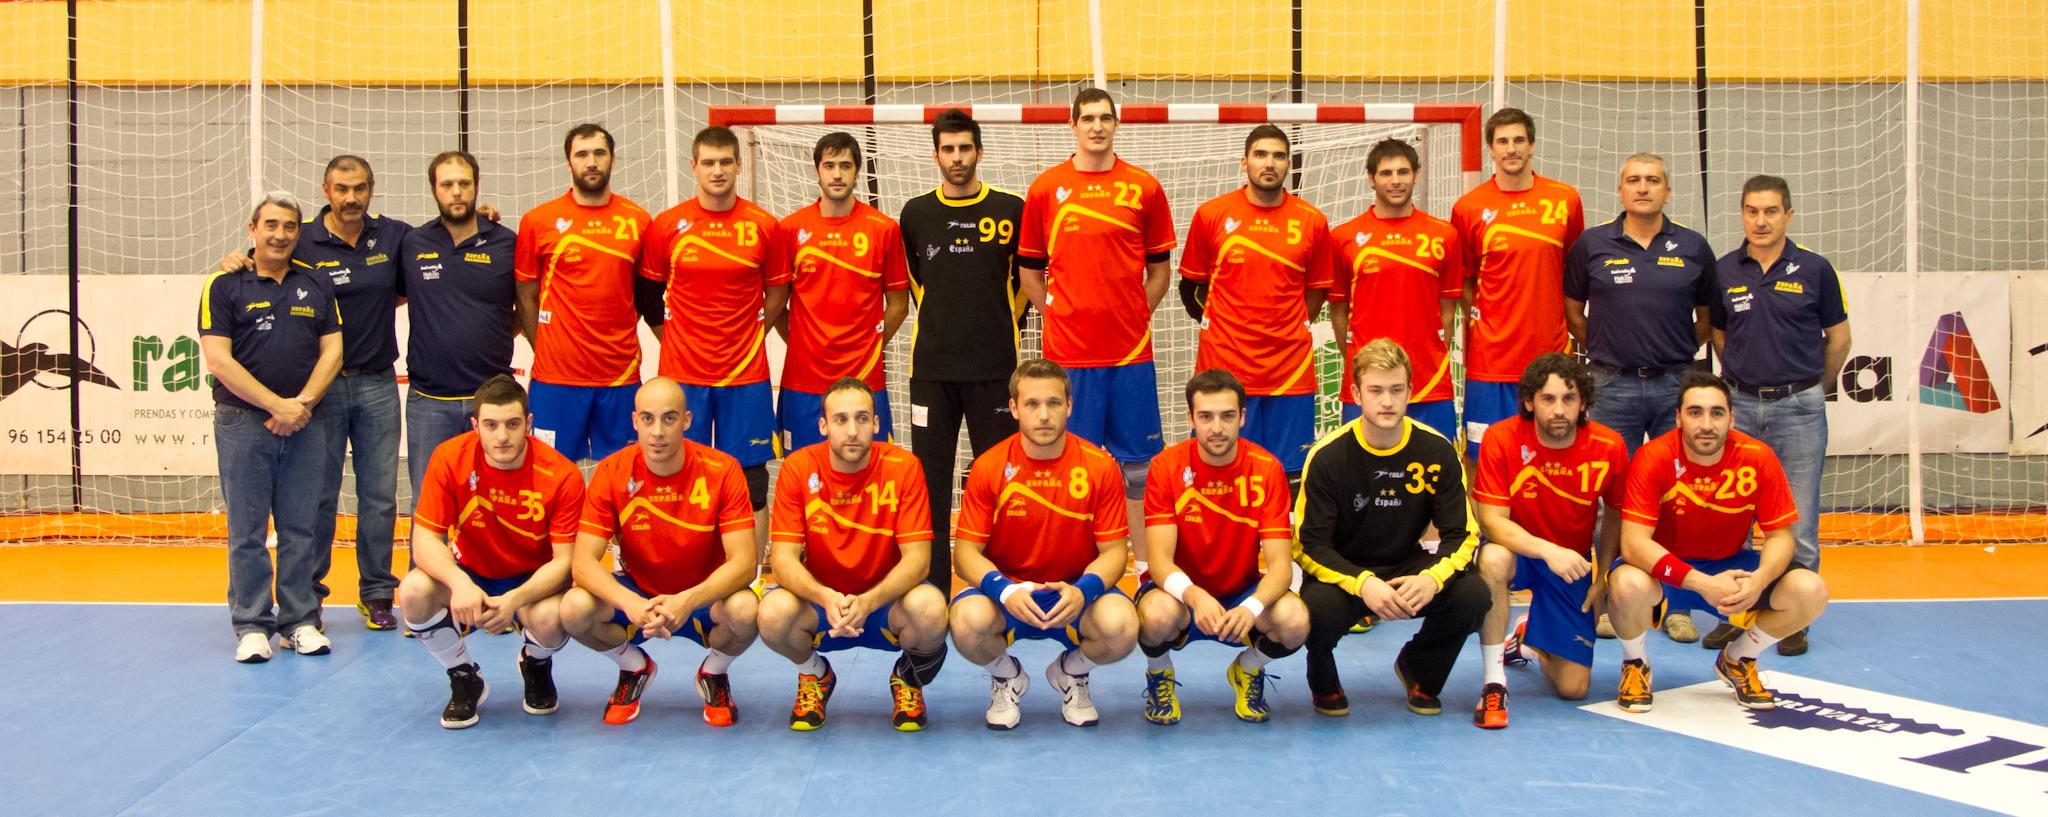 55b7a67e Spanias herrelandslag i håndball – Wikipedia